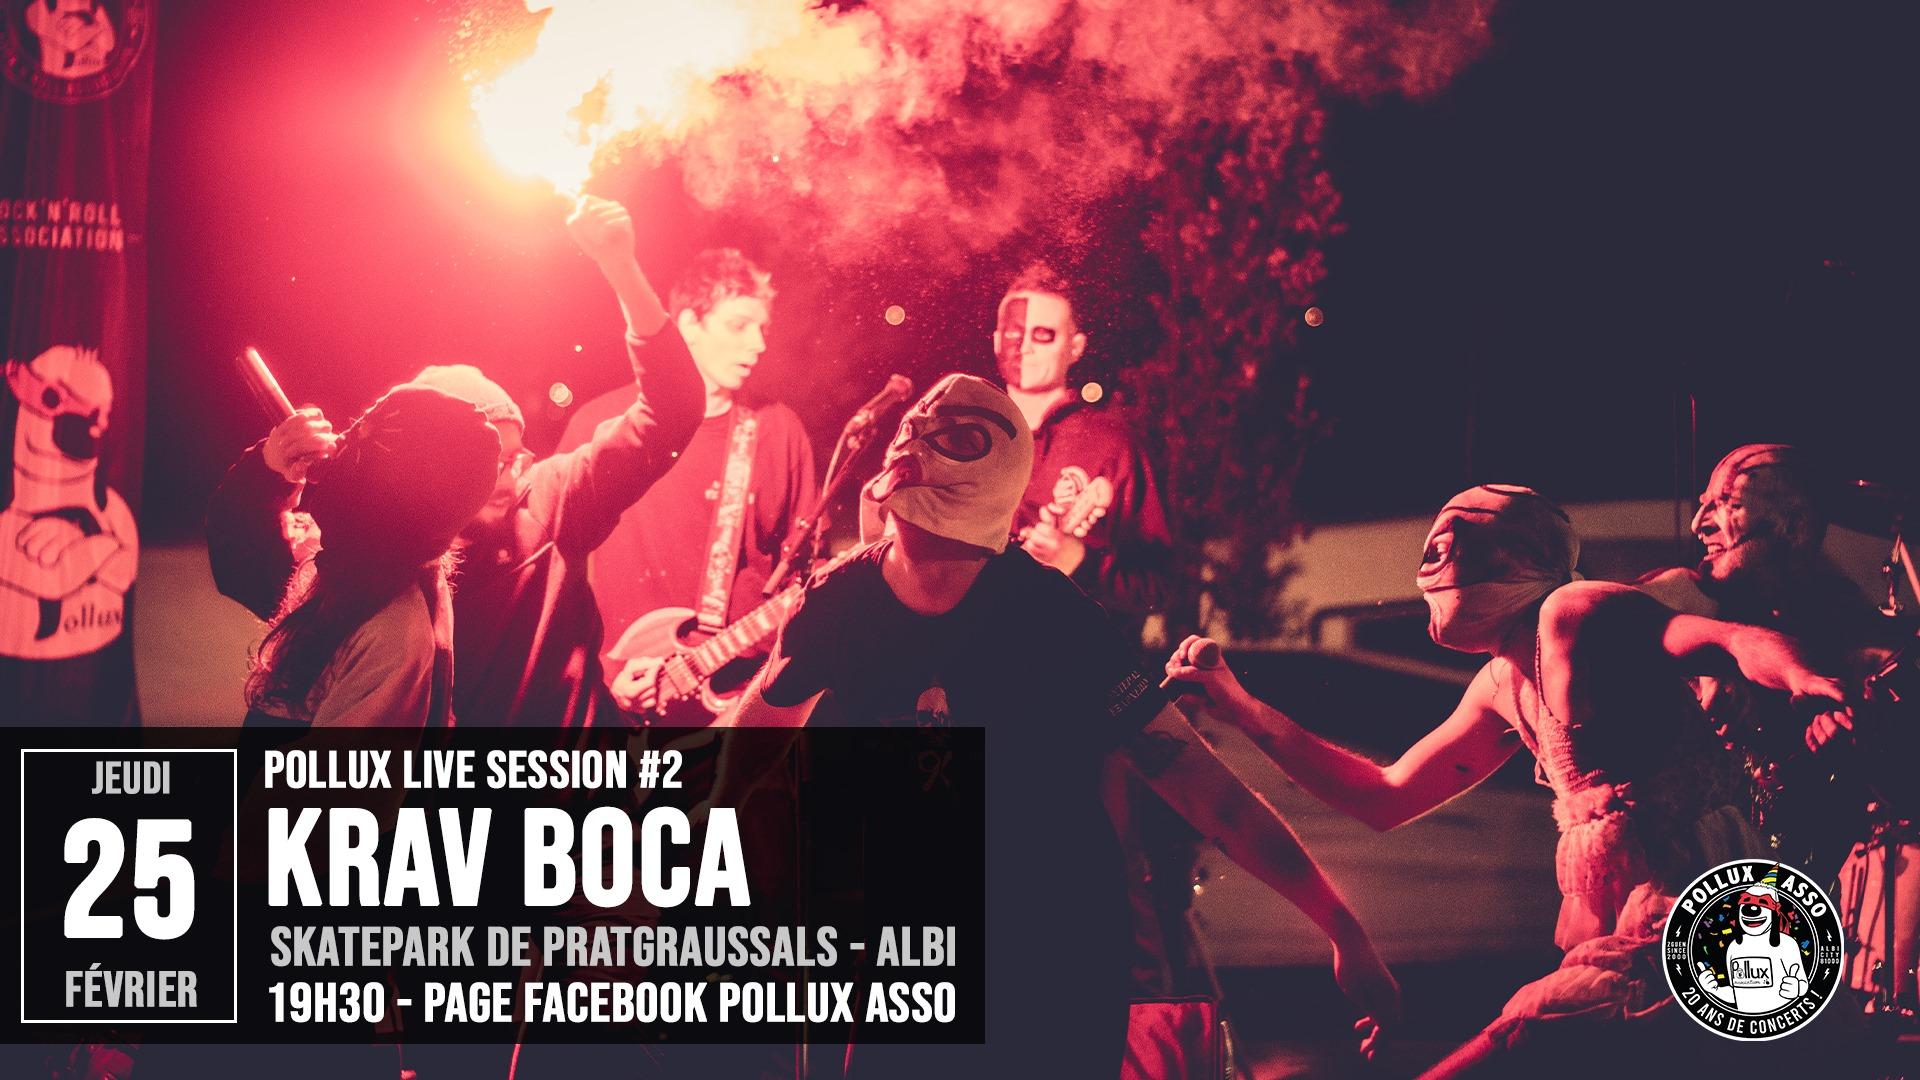 KRAV BOCA proposera un concert en streaming ce jeudi soir